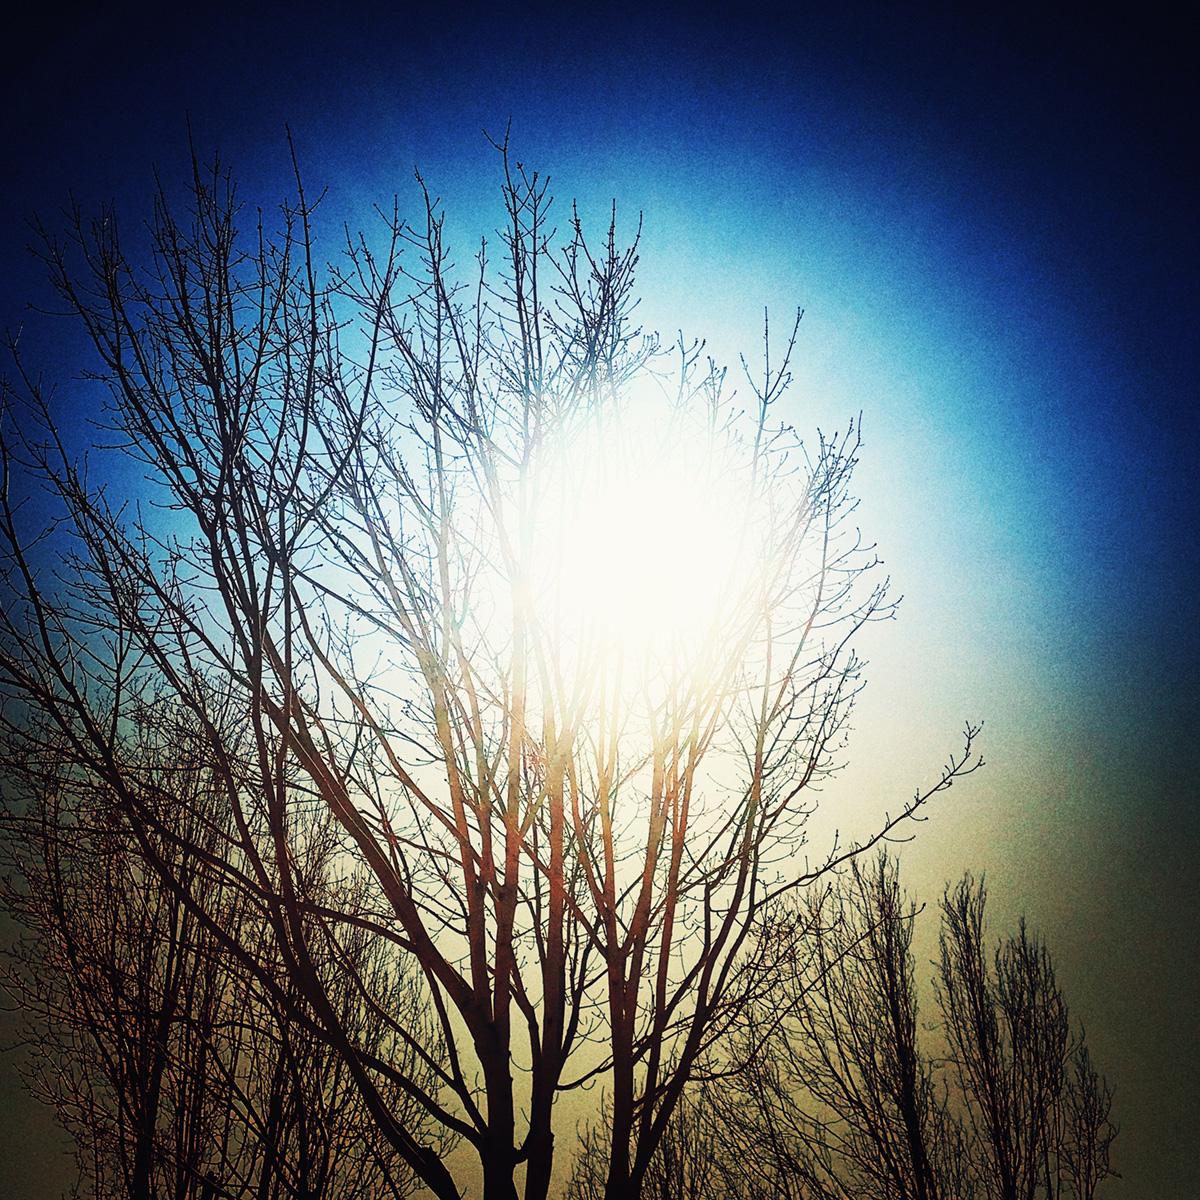 Bright Light in the Bare Tree 1